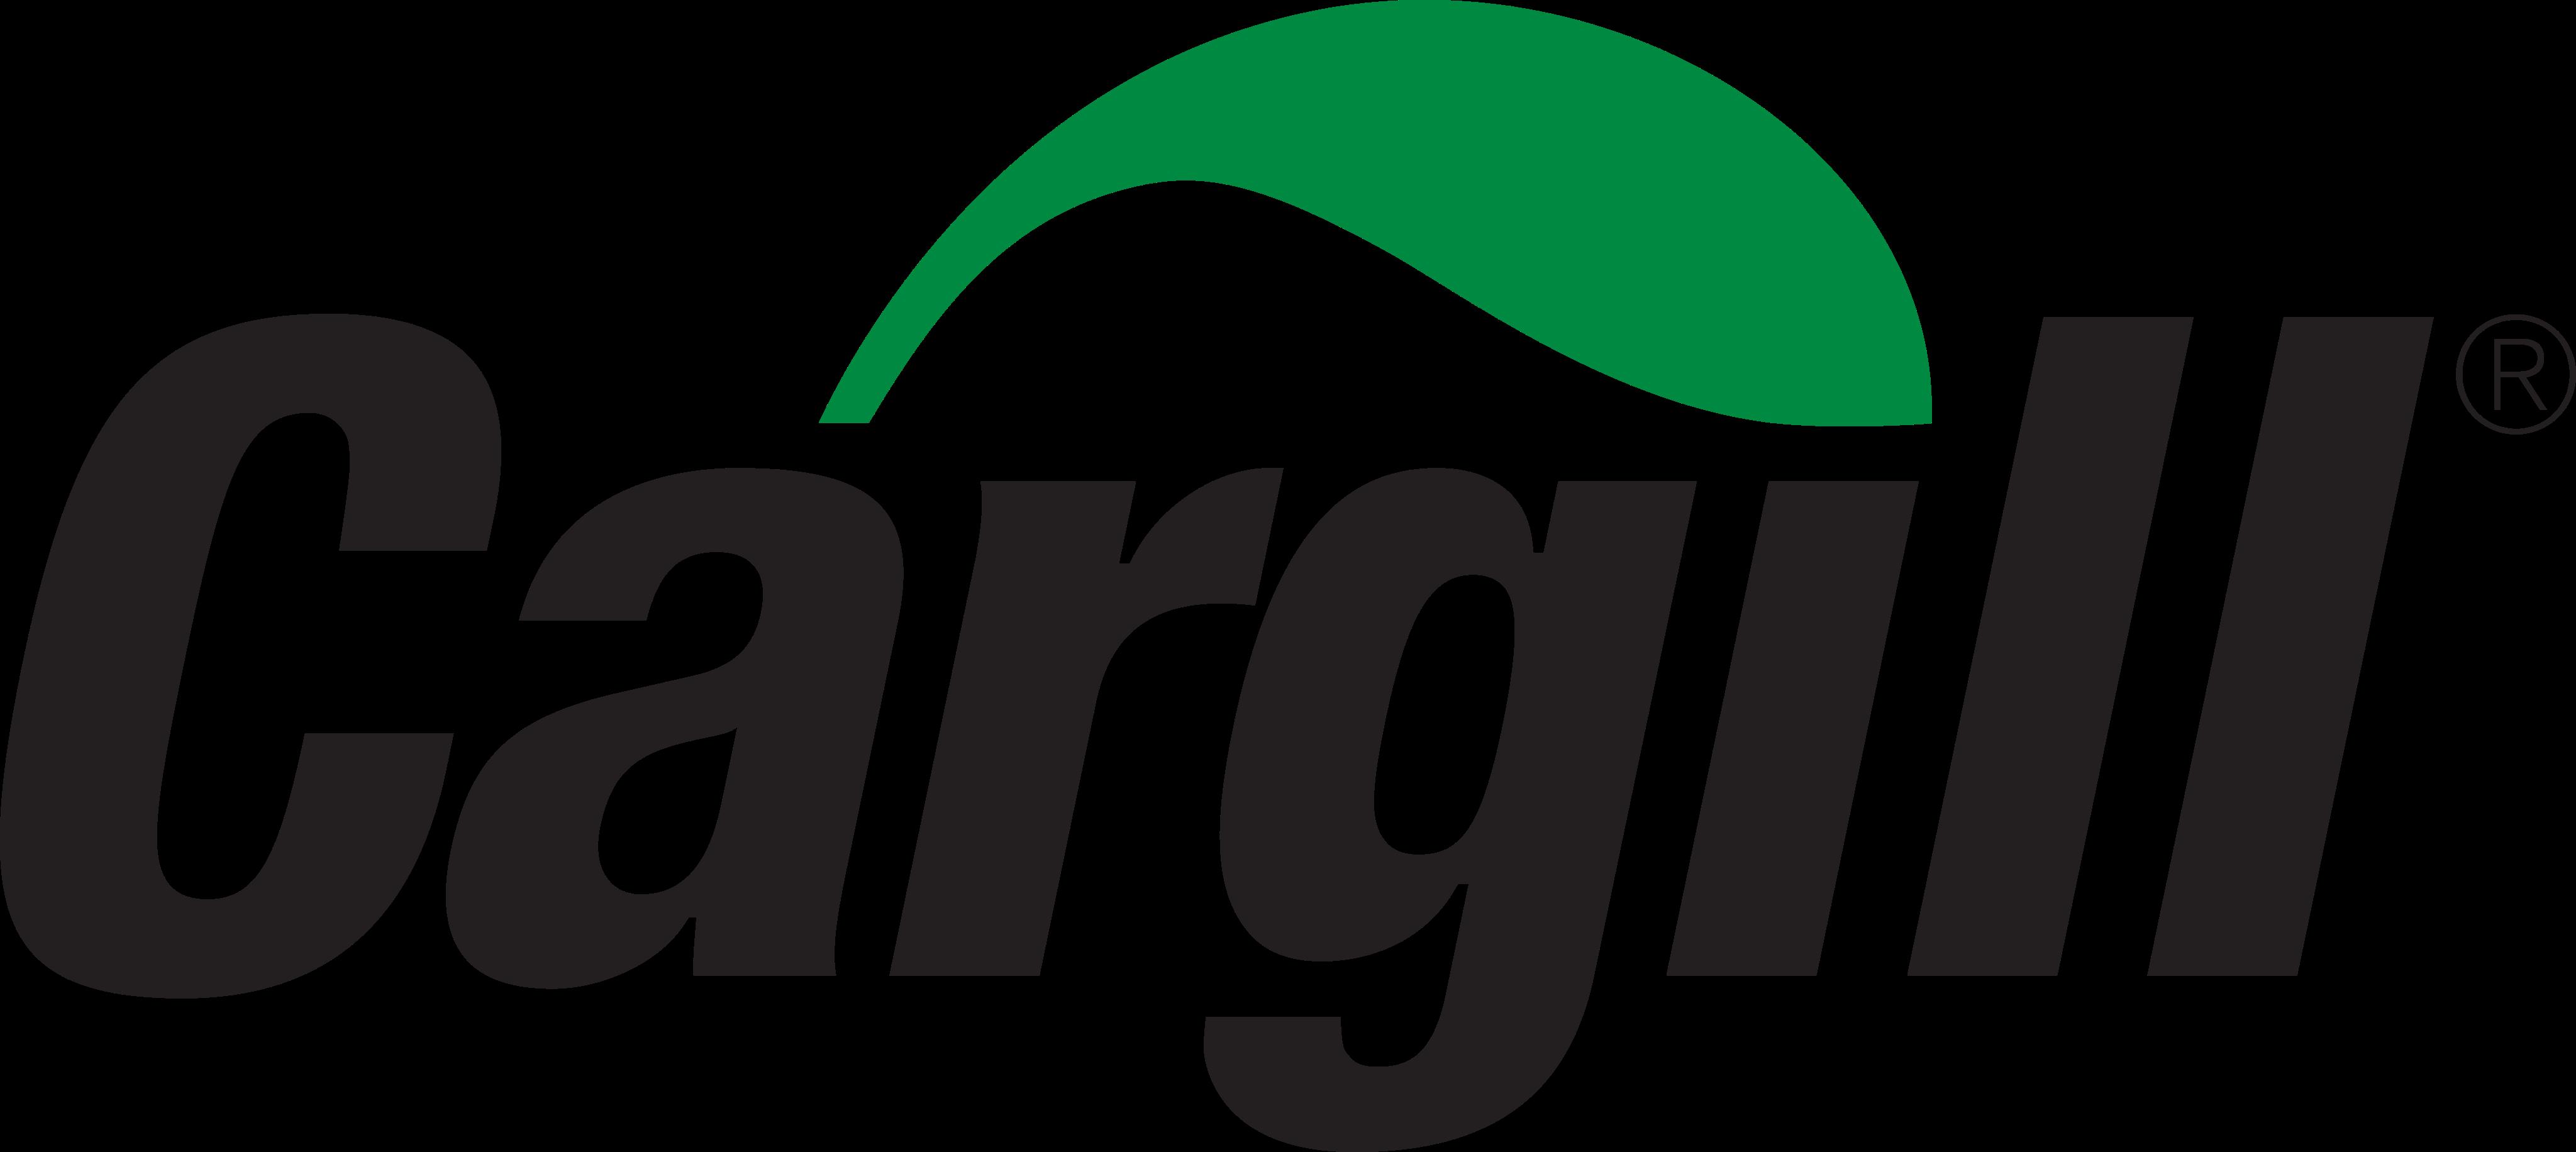 Cargill Logo - PNG e Vetor - Download de Logo